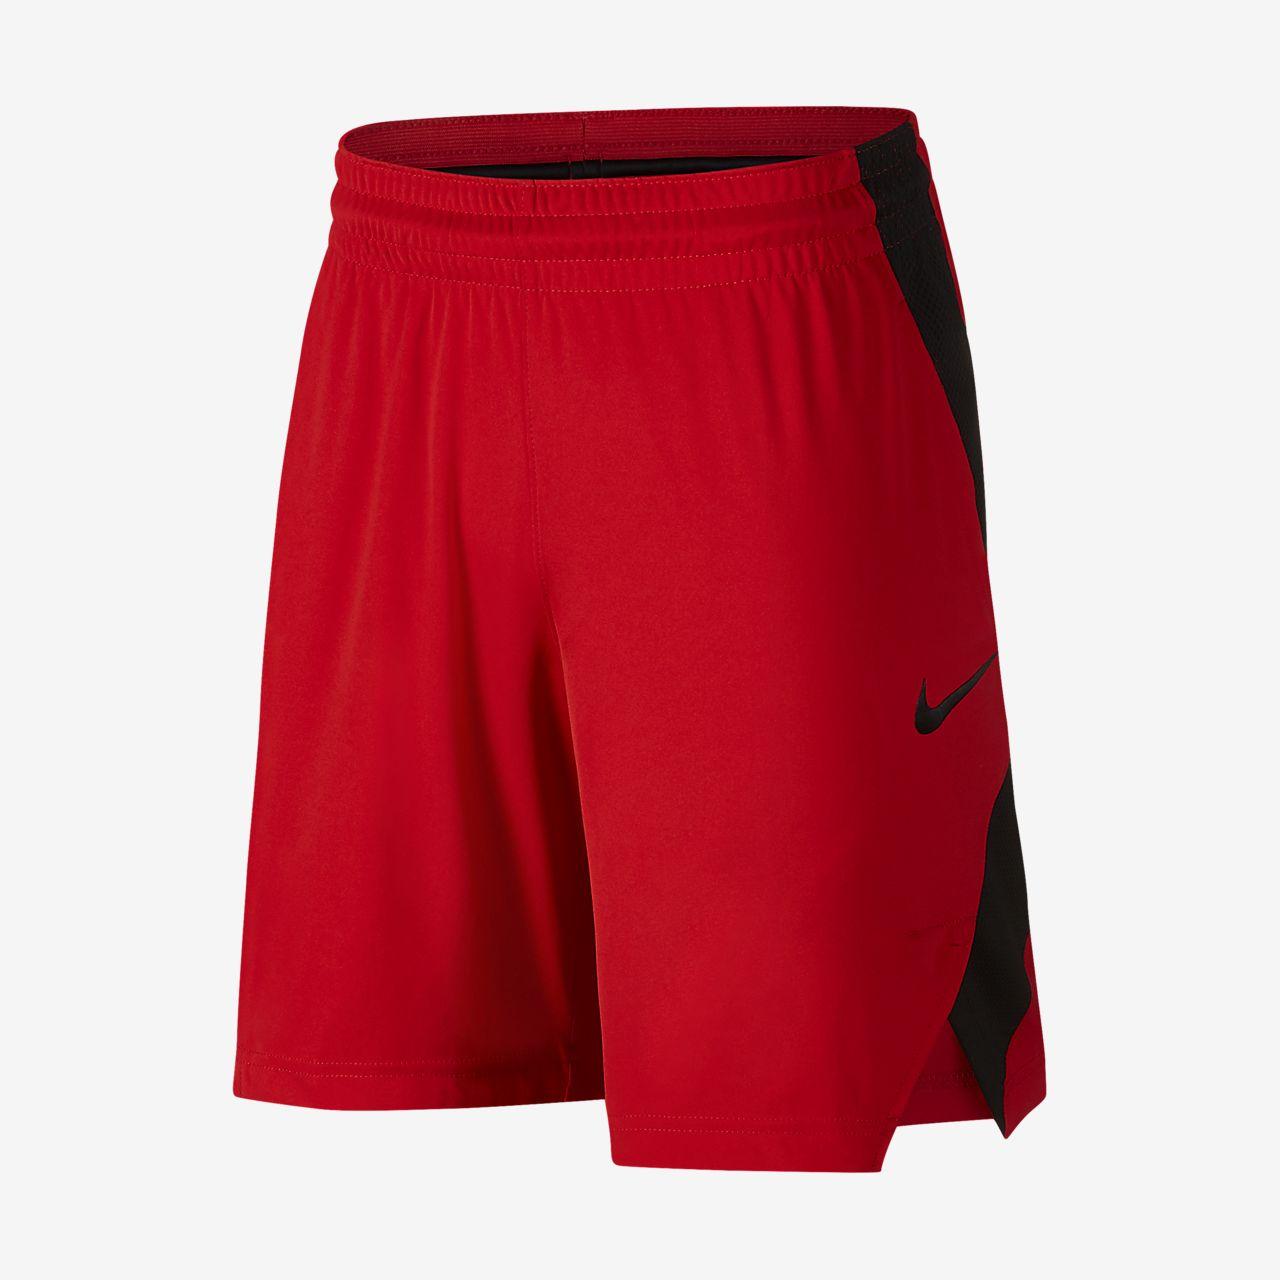 34b8b2ddabae Nike Dry Elite Women s Basketball Shorts. Nike.com IN